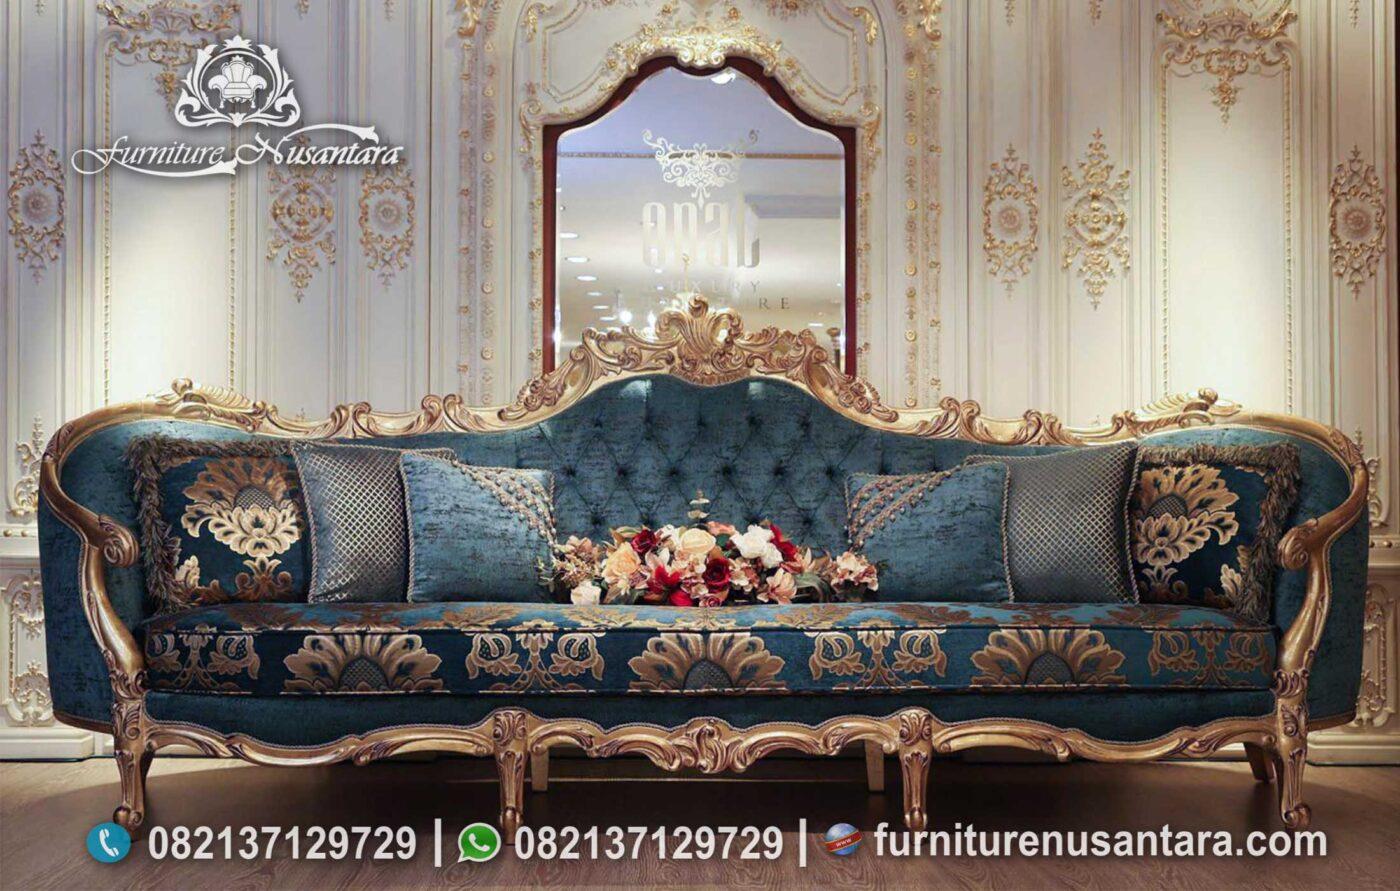 Sofa Klasik Ukir Jepara Warna Hijau ST-45, Furniture Nusantara